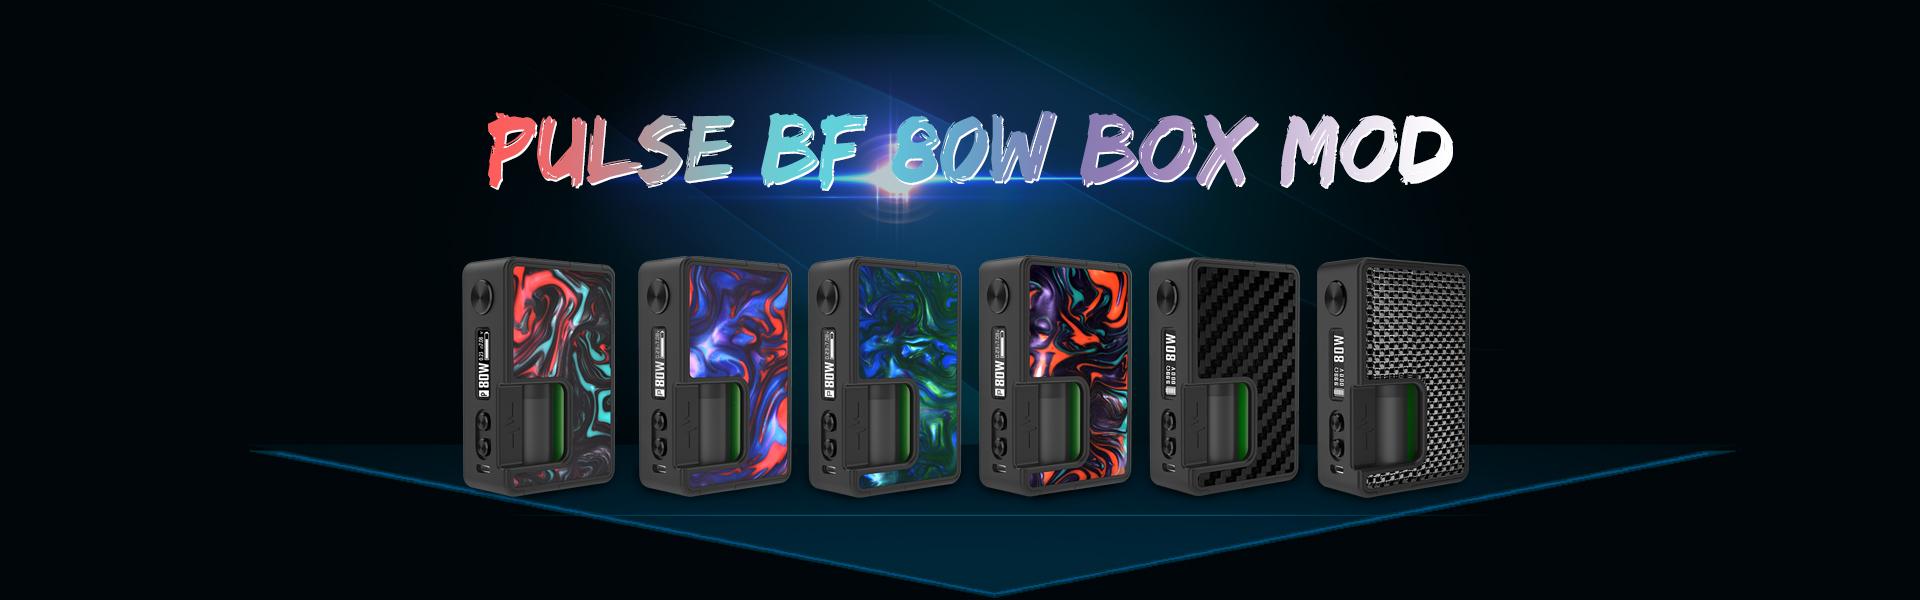 pulse-bf-80w-box-mod-2.jpg